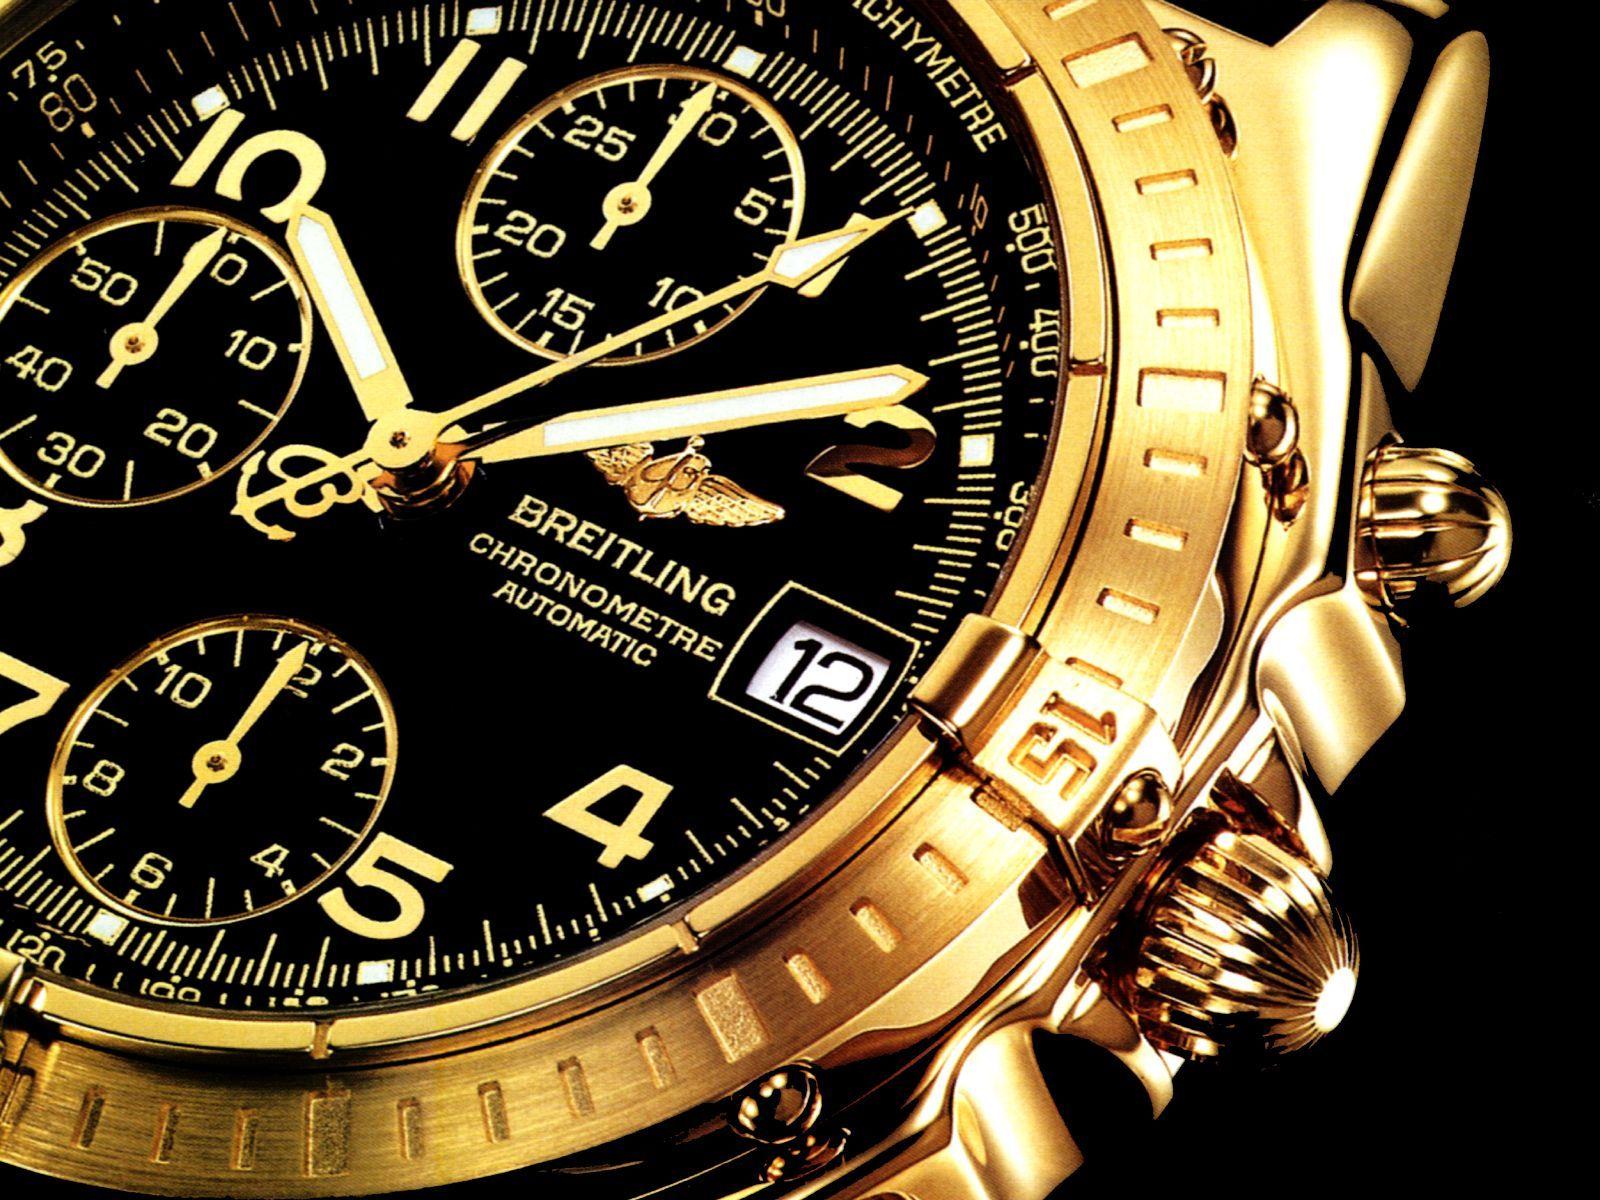 Wrist Watch Wallpapers   Top Wrist Watch Backgrounds 1600x1200